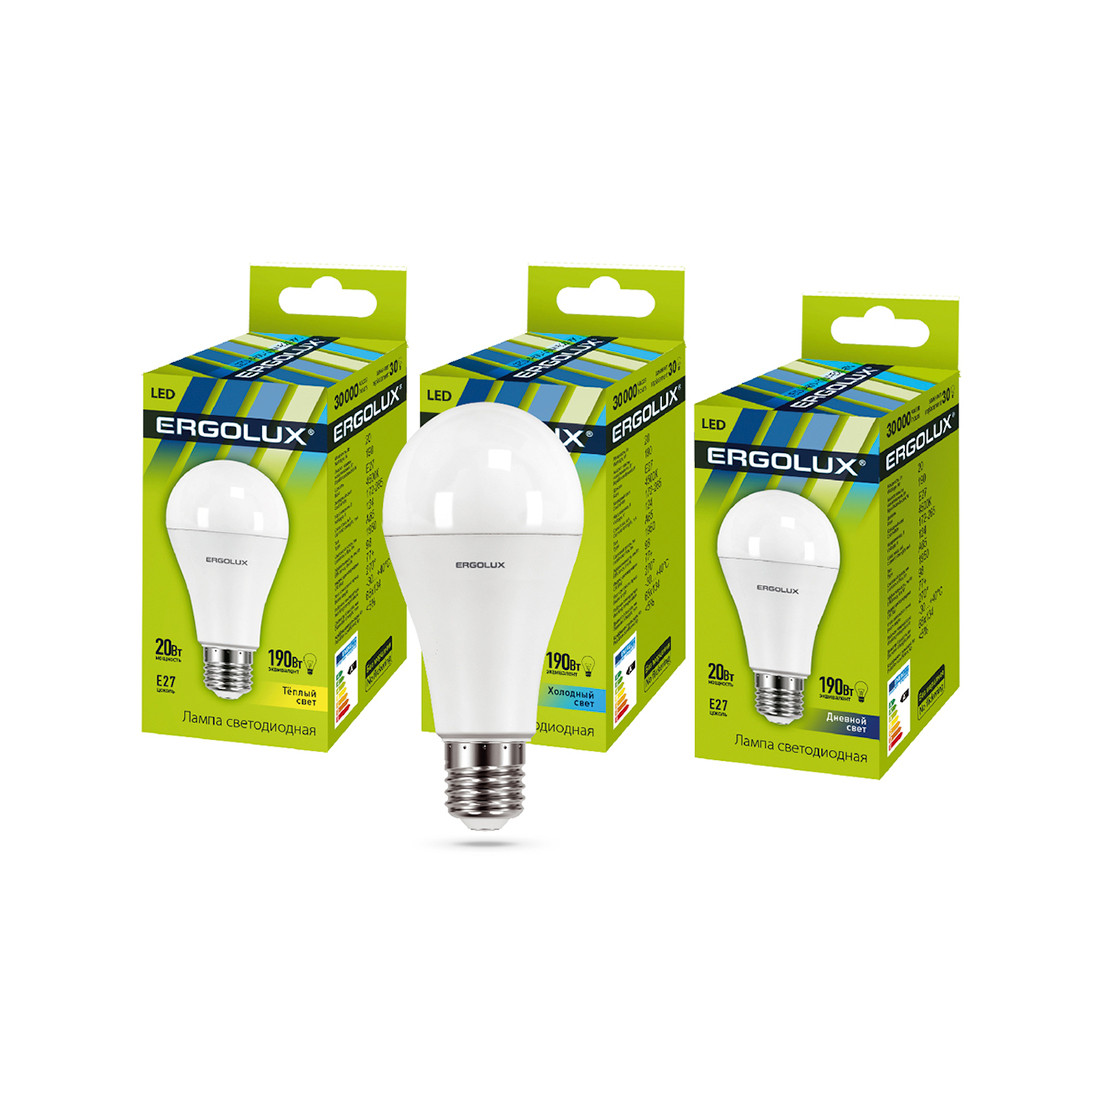 Эл. лампа светодиодная Ergolux LED-A65-20W-E27-3K, Тёплый